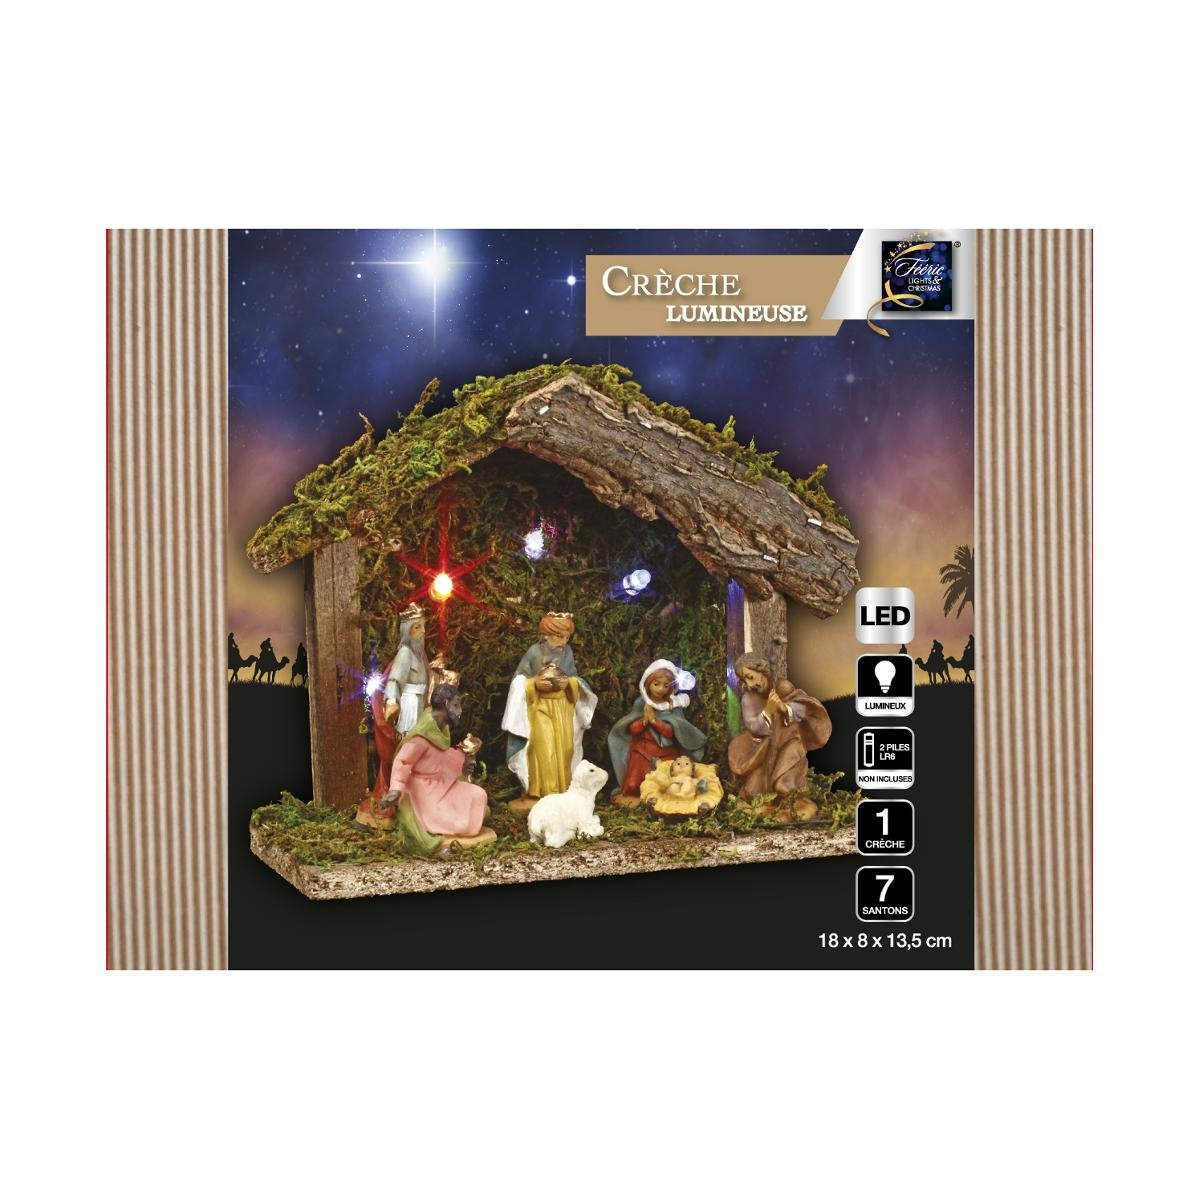 3 En 1 Ensemble De Noel 1 Creche Lumineuse Ses 7 Santons 1